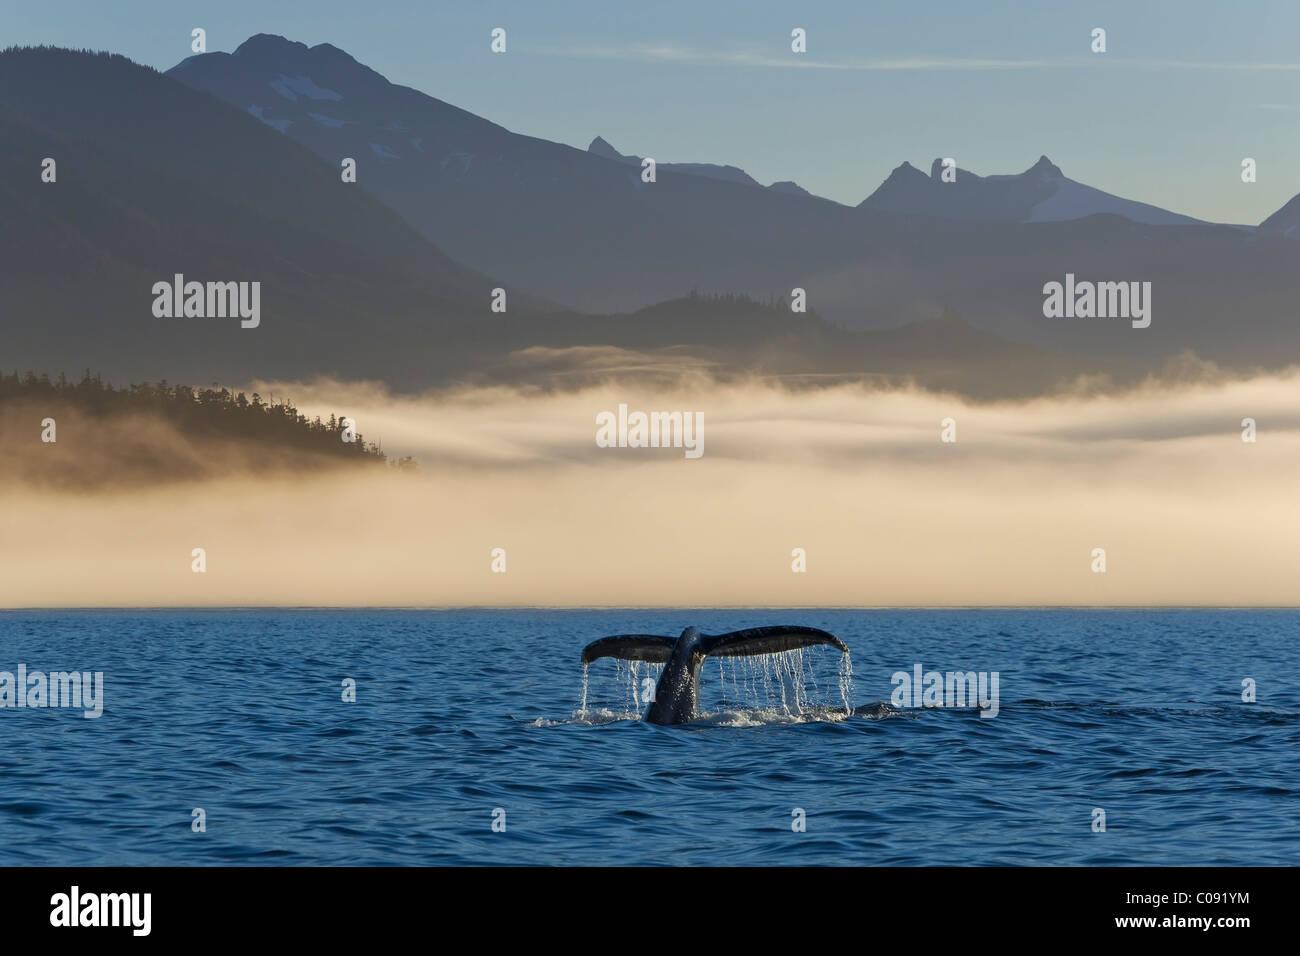 Humpback Whale tail visible along a fog shrouded shoreline in Frederick Sound, Inside Passage, Coastal Range, Alaska. - Stock Image